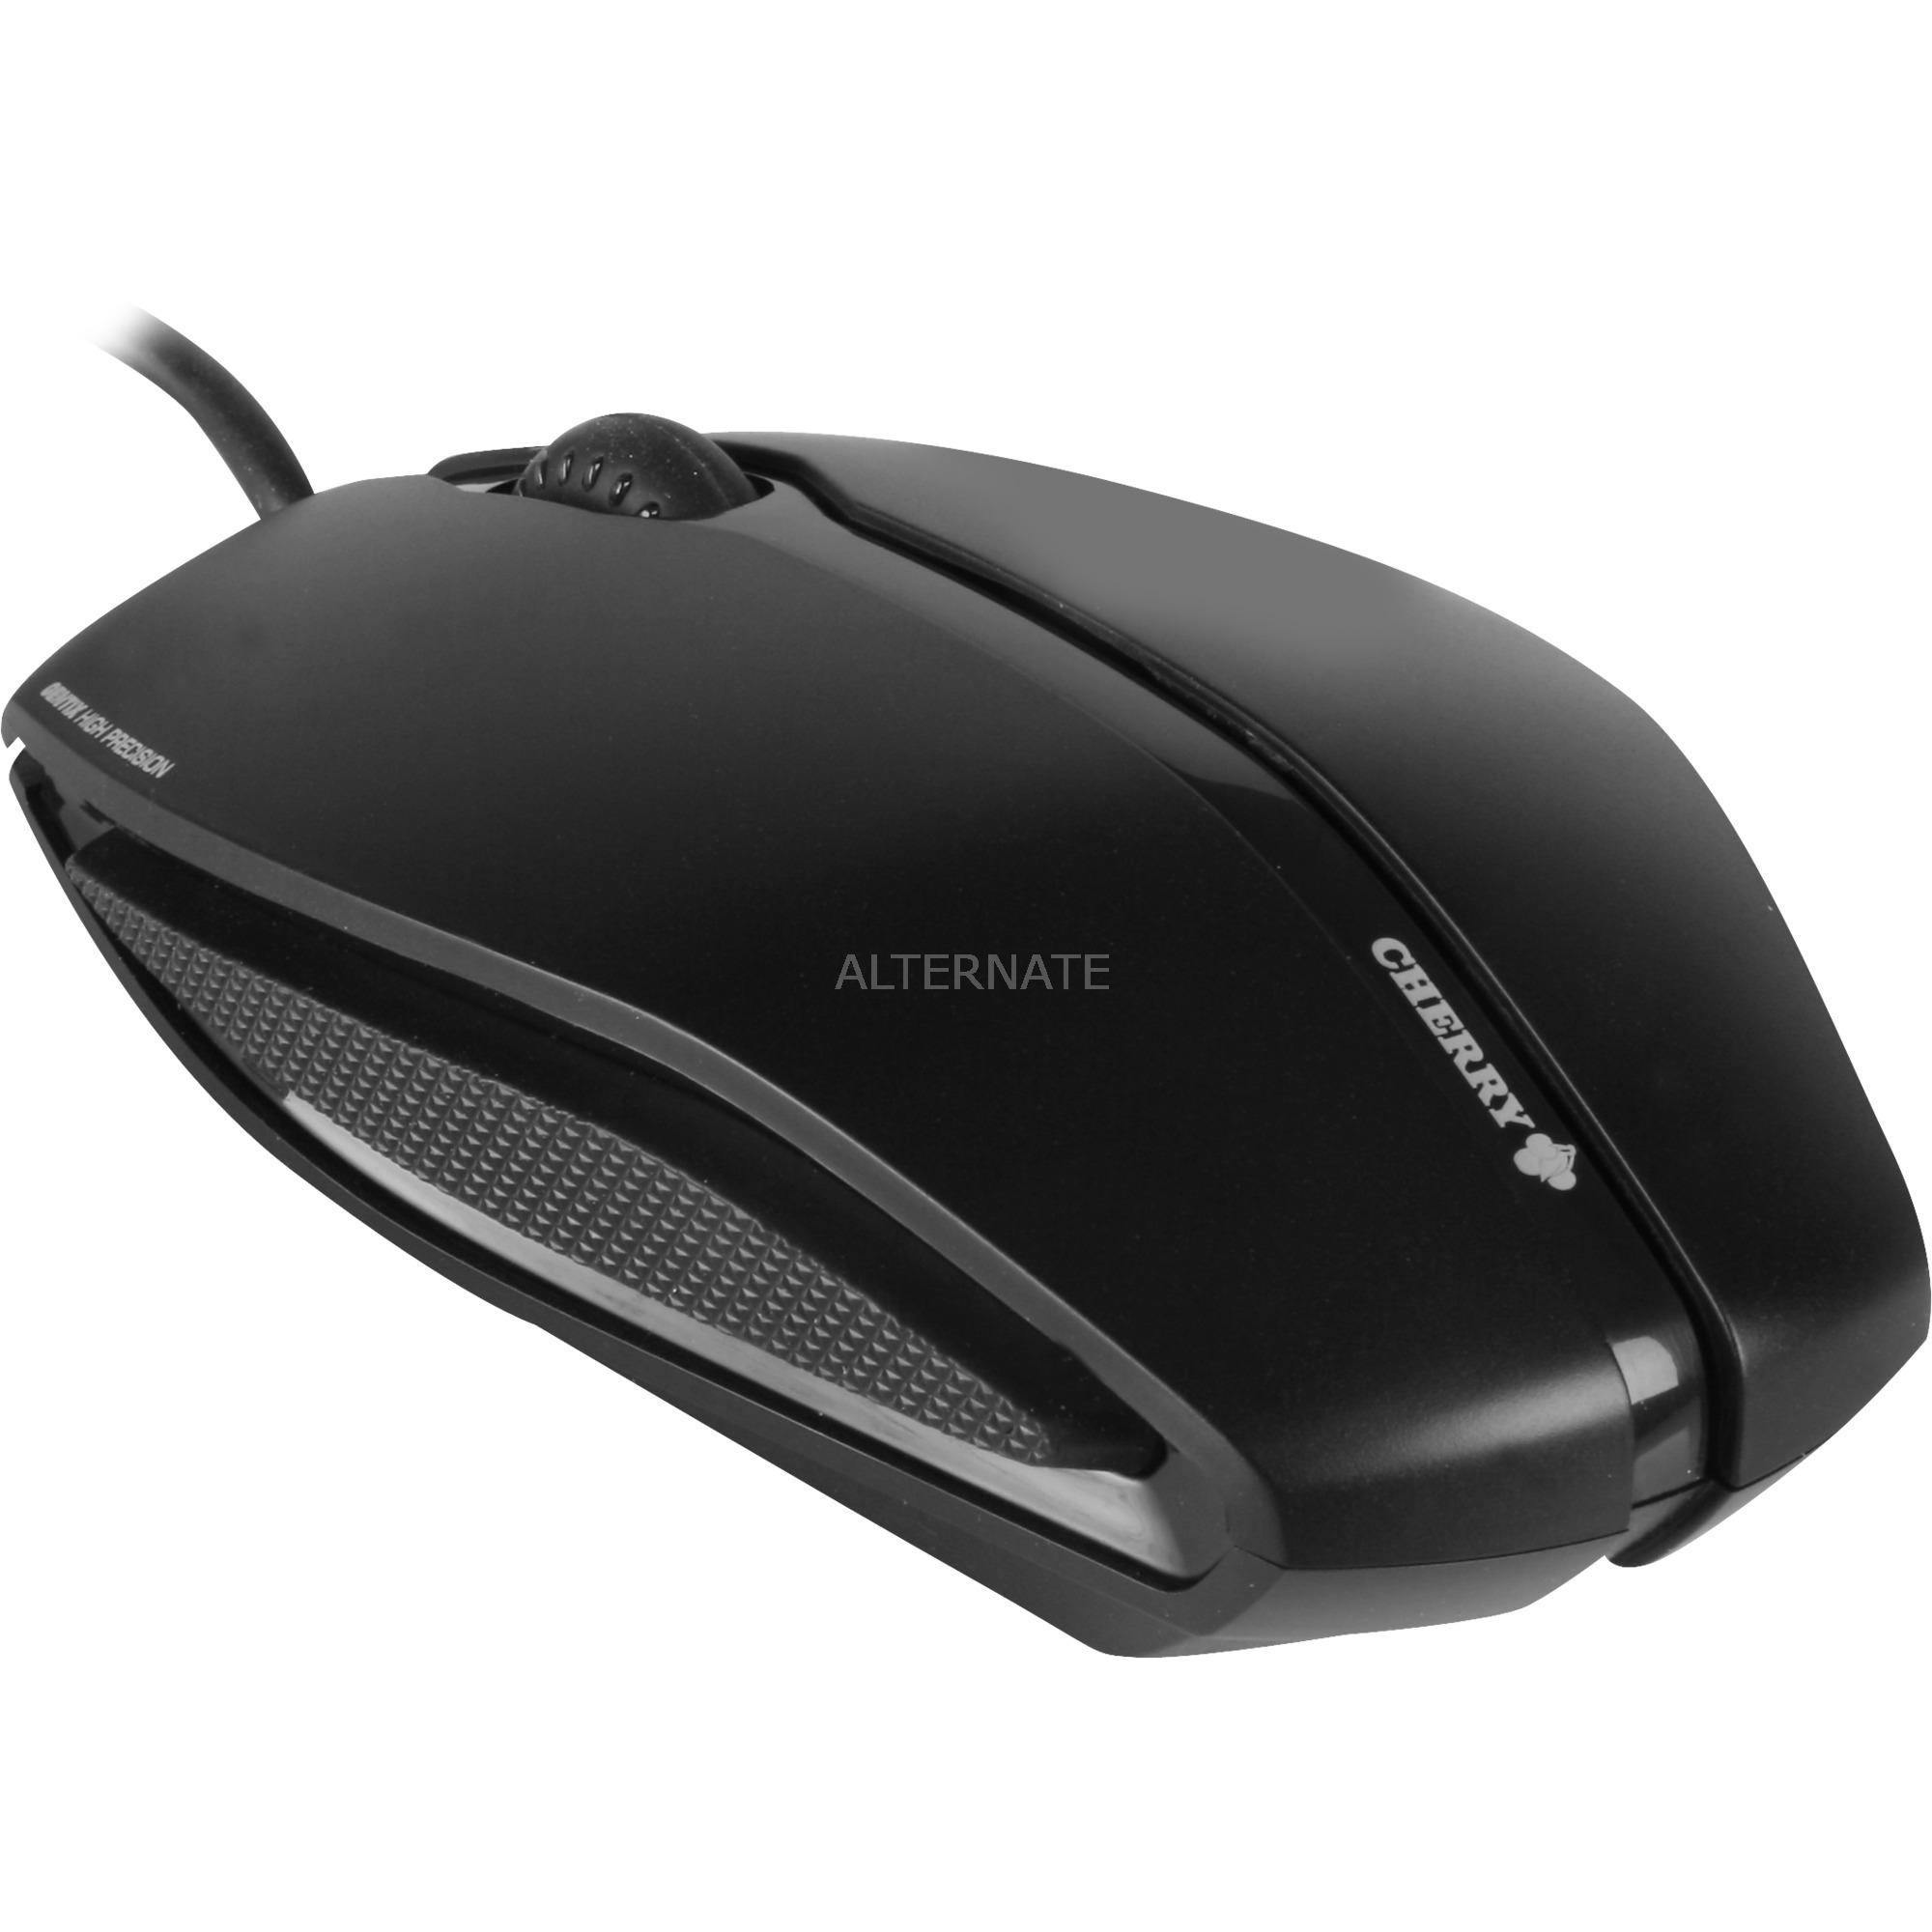 Gentix ratón USB Óptico 1000 DPI Ambidextro